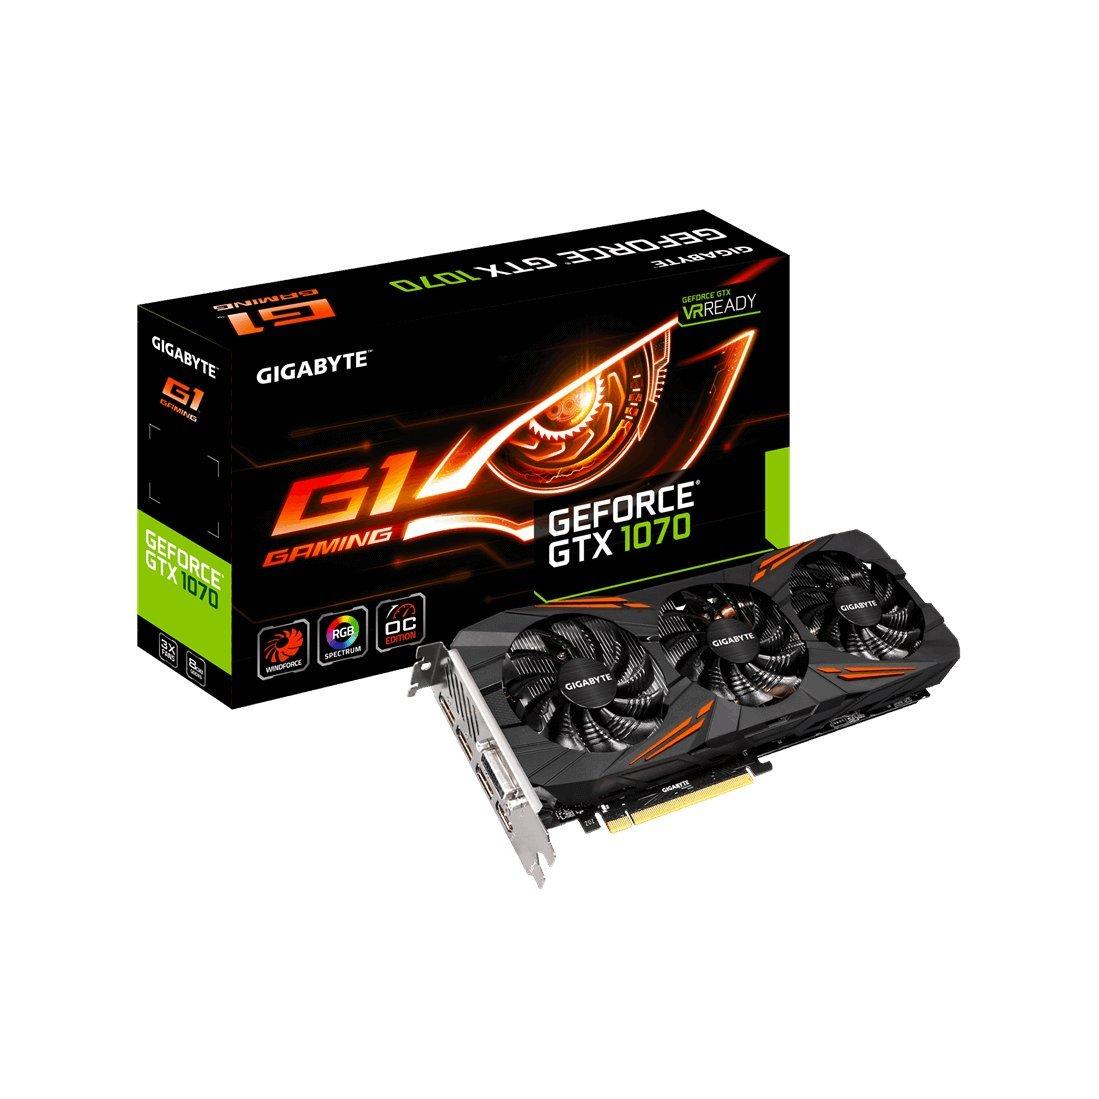 GIGABYTE ビデオカード NVIDIA GeForce GTX 1070搭載 オーバークロック ゲーミングモデル GV-N1070G1 Gaming-8GDがパソコン・周辺機器ストアでいつでもお買い得。当日お急ぎ便対象商品は、当日お届け可能です。アマゾン配送商品は、通常配送無料(一部除く)。